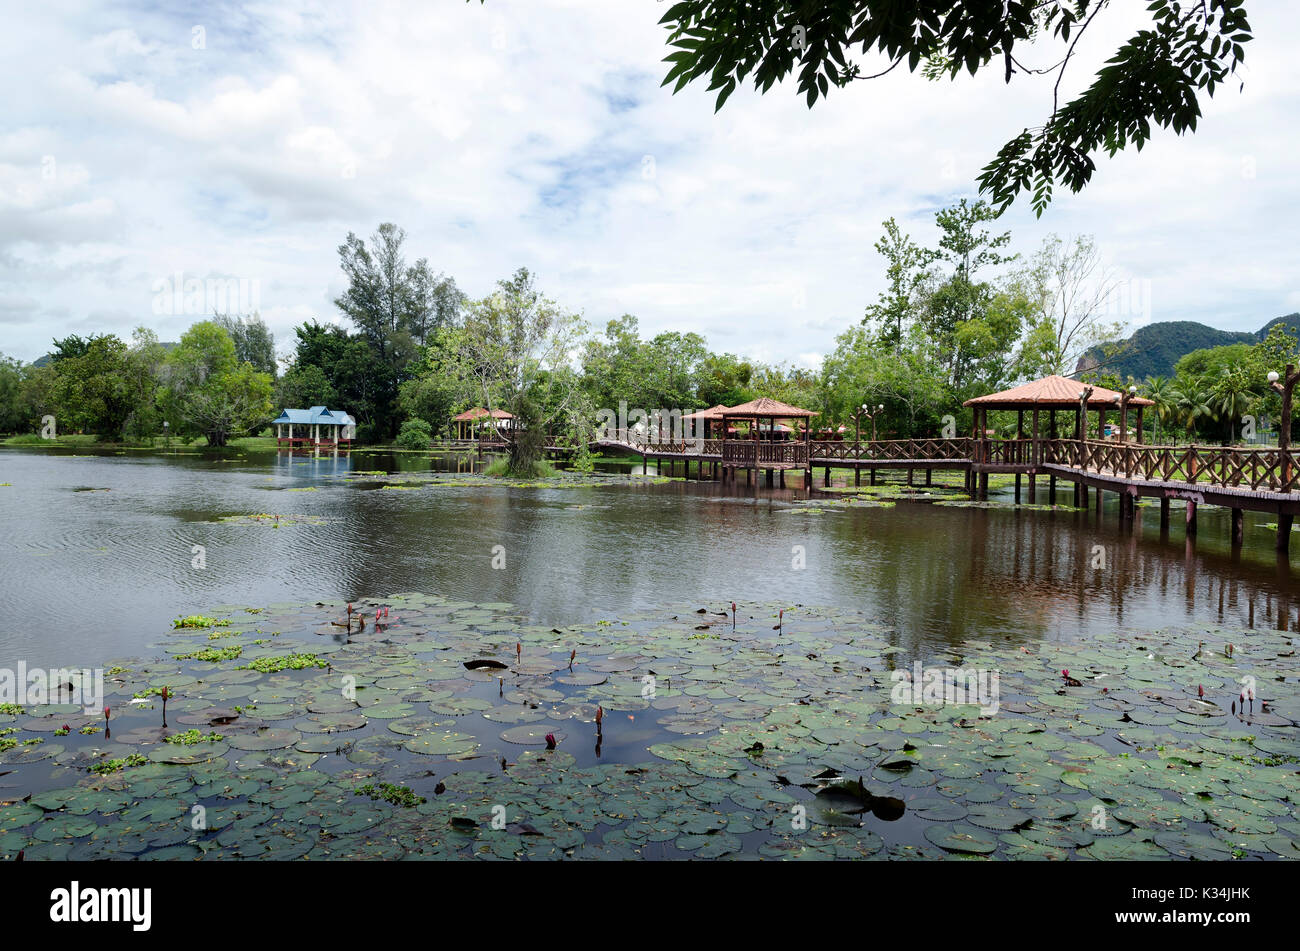 Taman Rekreasi Tasik Melati, Perlis, Malaysia - Tasik Melati is a wetland  famous for its lakes and its recreational facilities - Stock Image